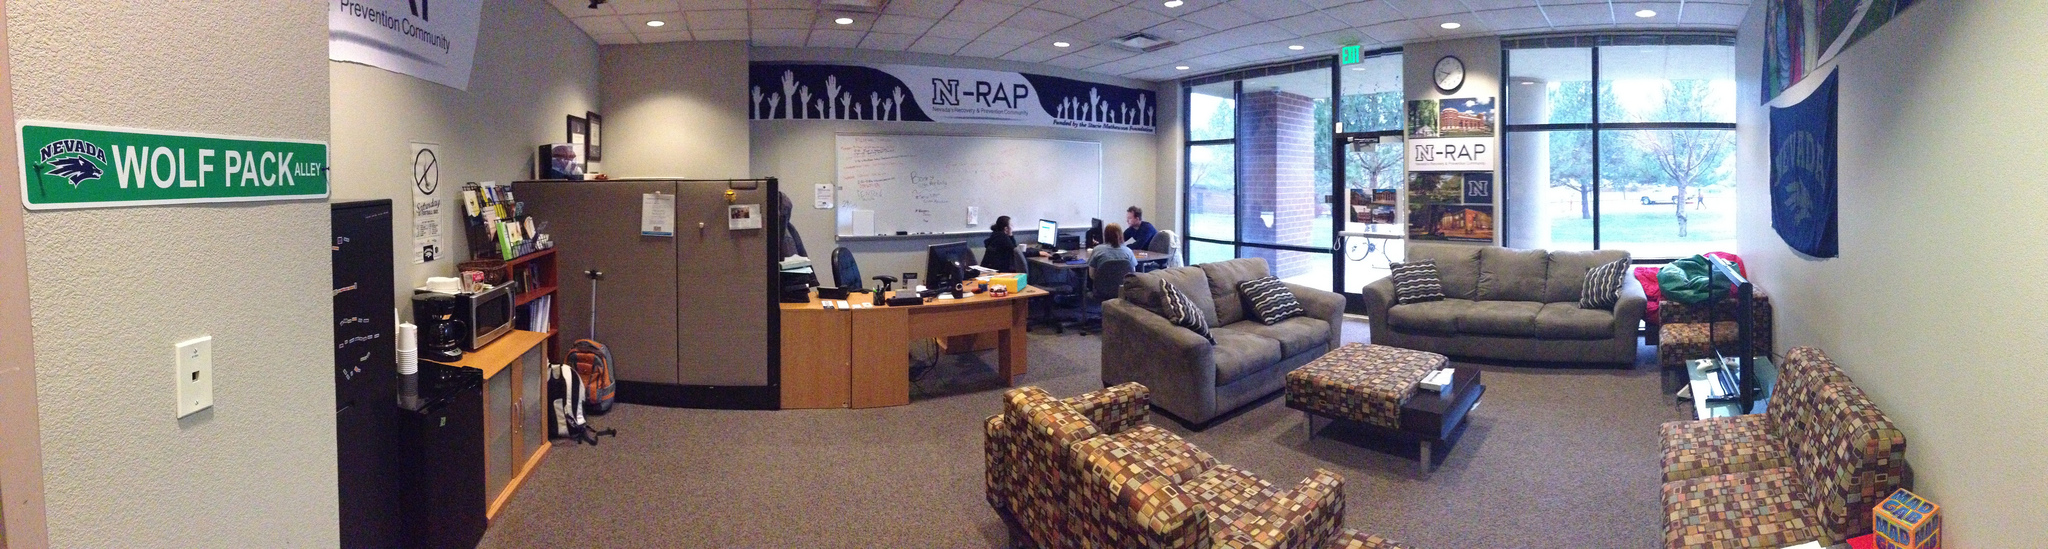 NRAP lounge